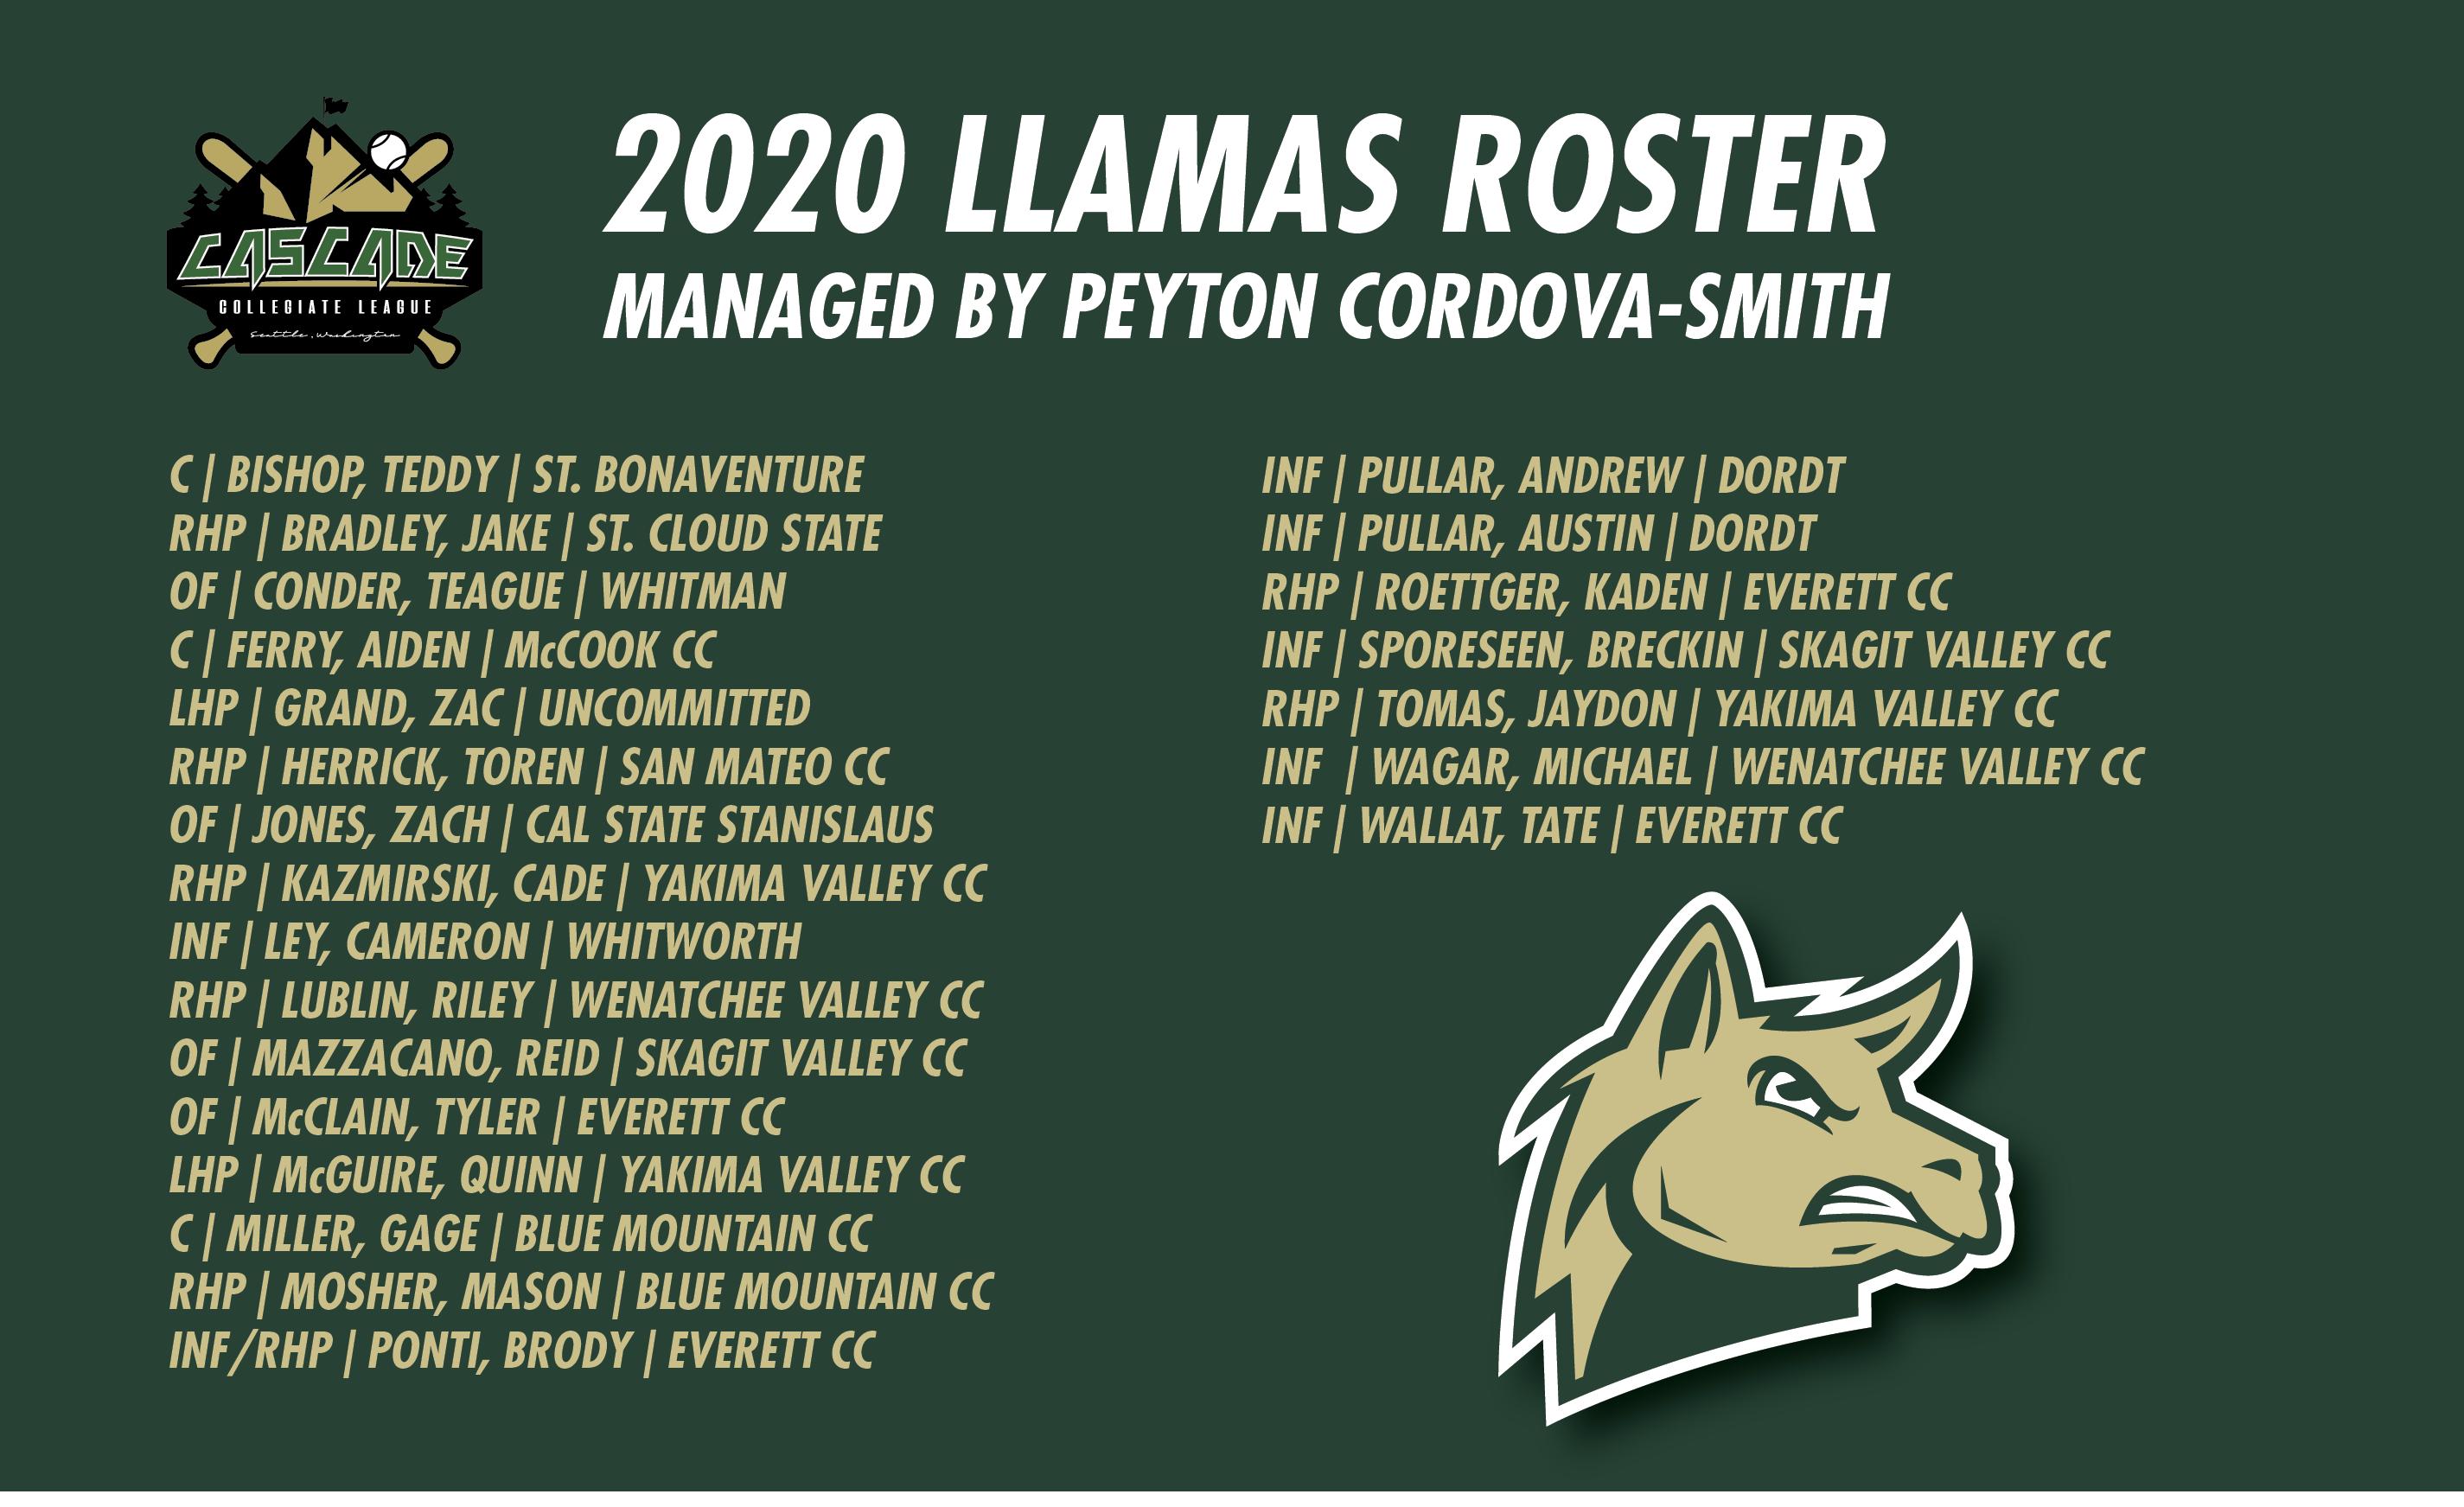 2020 LLAMAS ROSTER